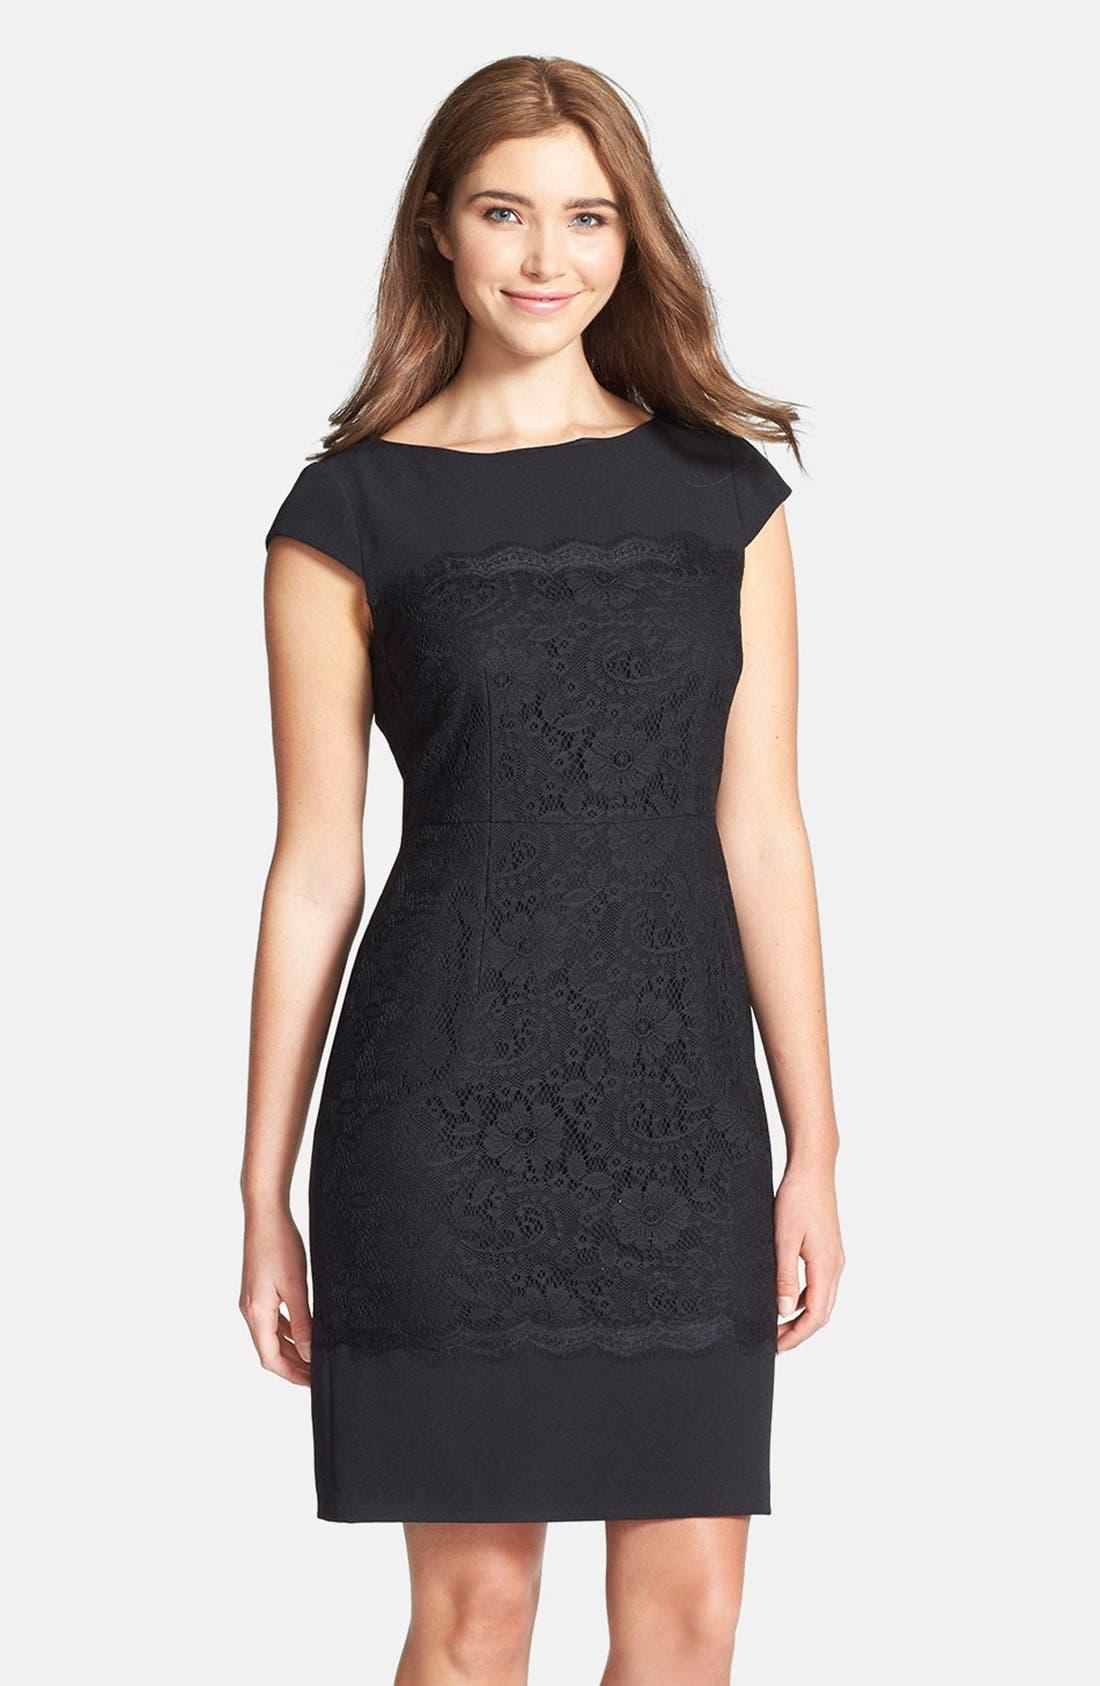 Main Image - Adrianna Papell Scalloped Lace Sheath Dress (Regular & Petite)